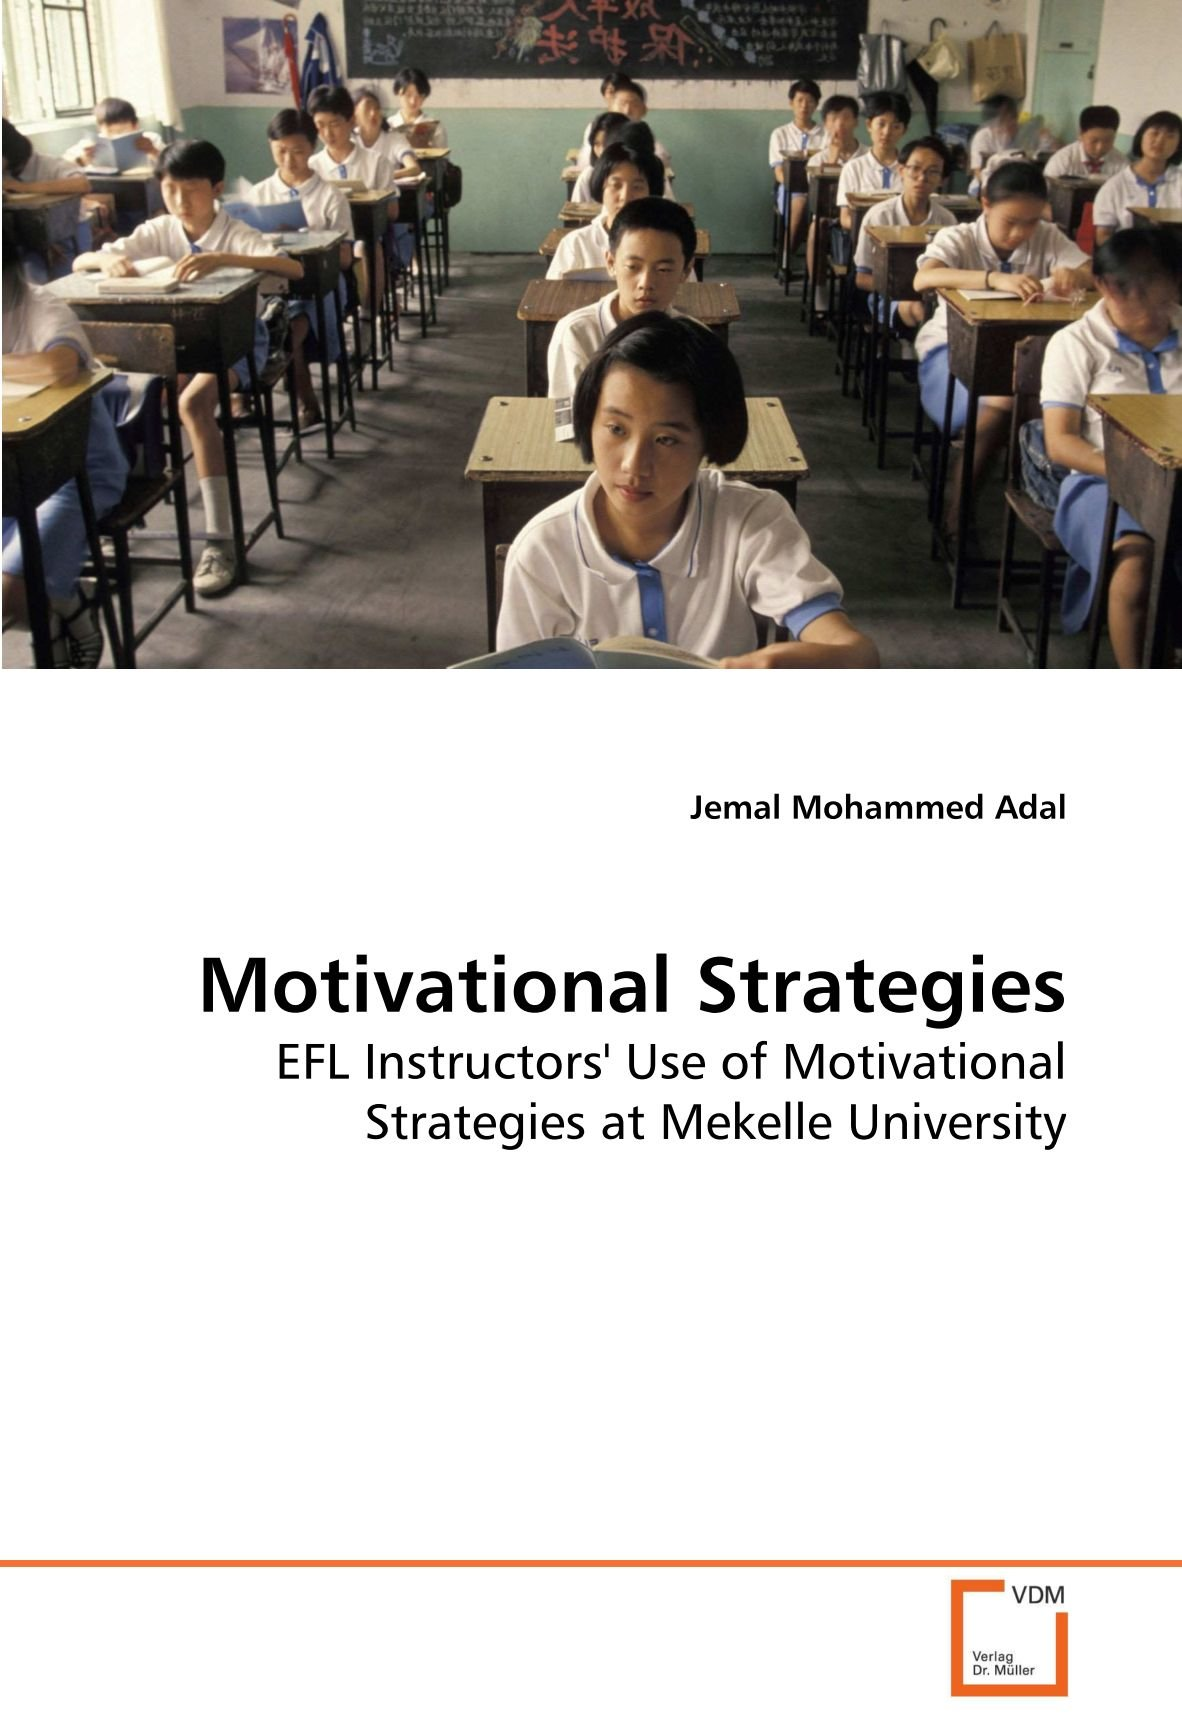 Download Motivational Strategies: EFL Instructors' Use of Motivational Strategies at Mekelle University pdf